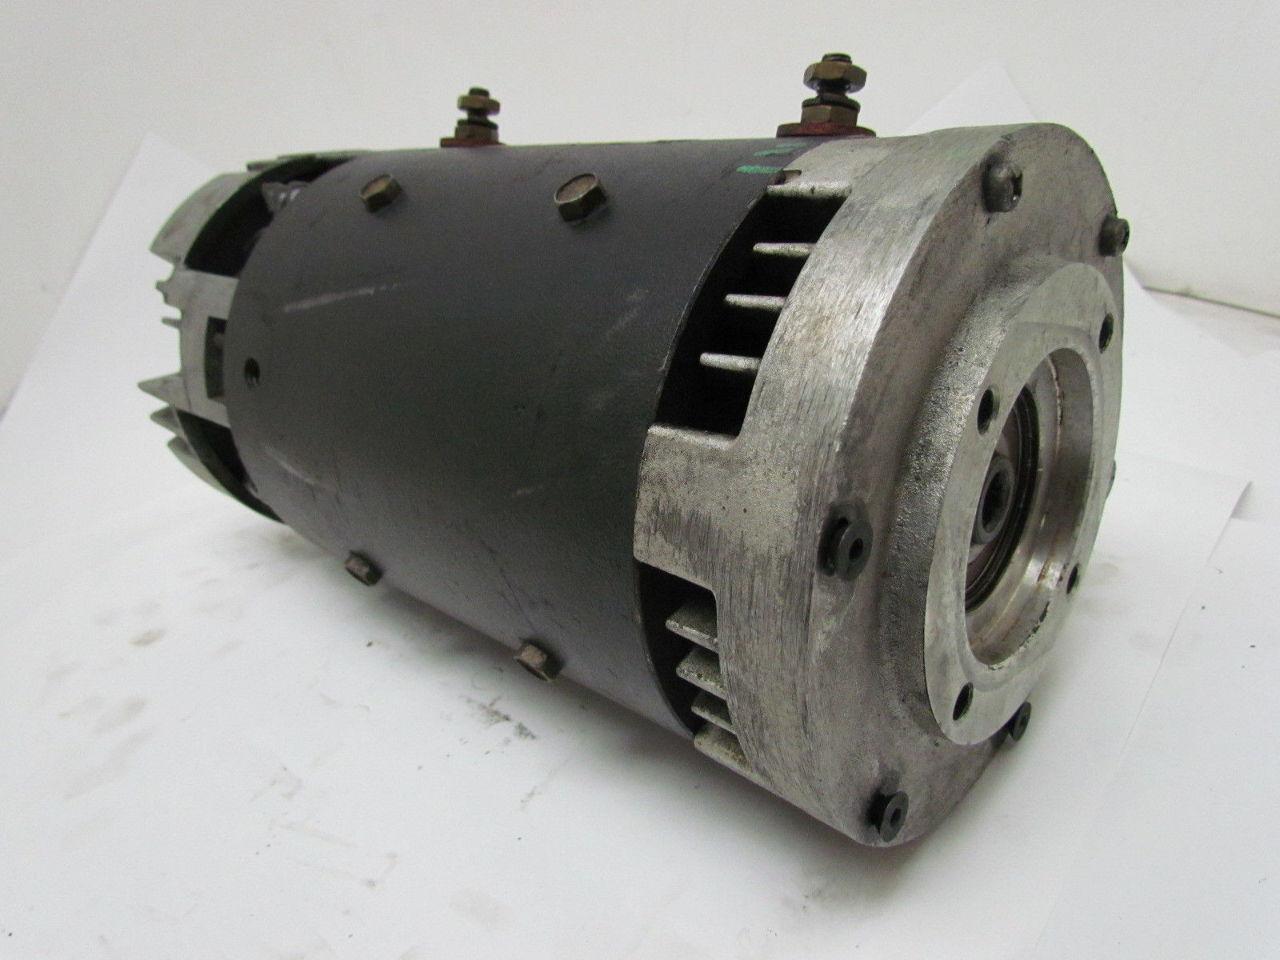 36 volt 2000 harley sportster wiring diagram raymond prestolite mly 4002 dc pump motor good